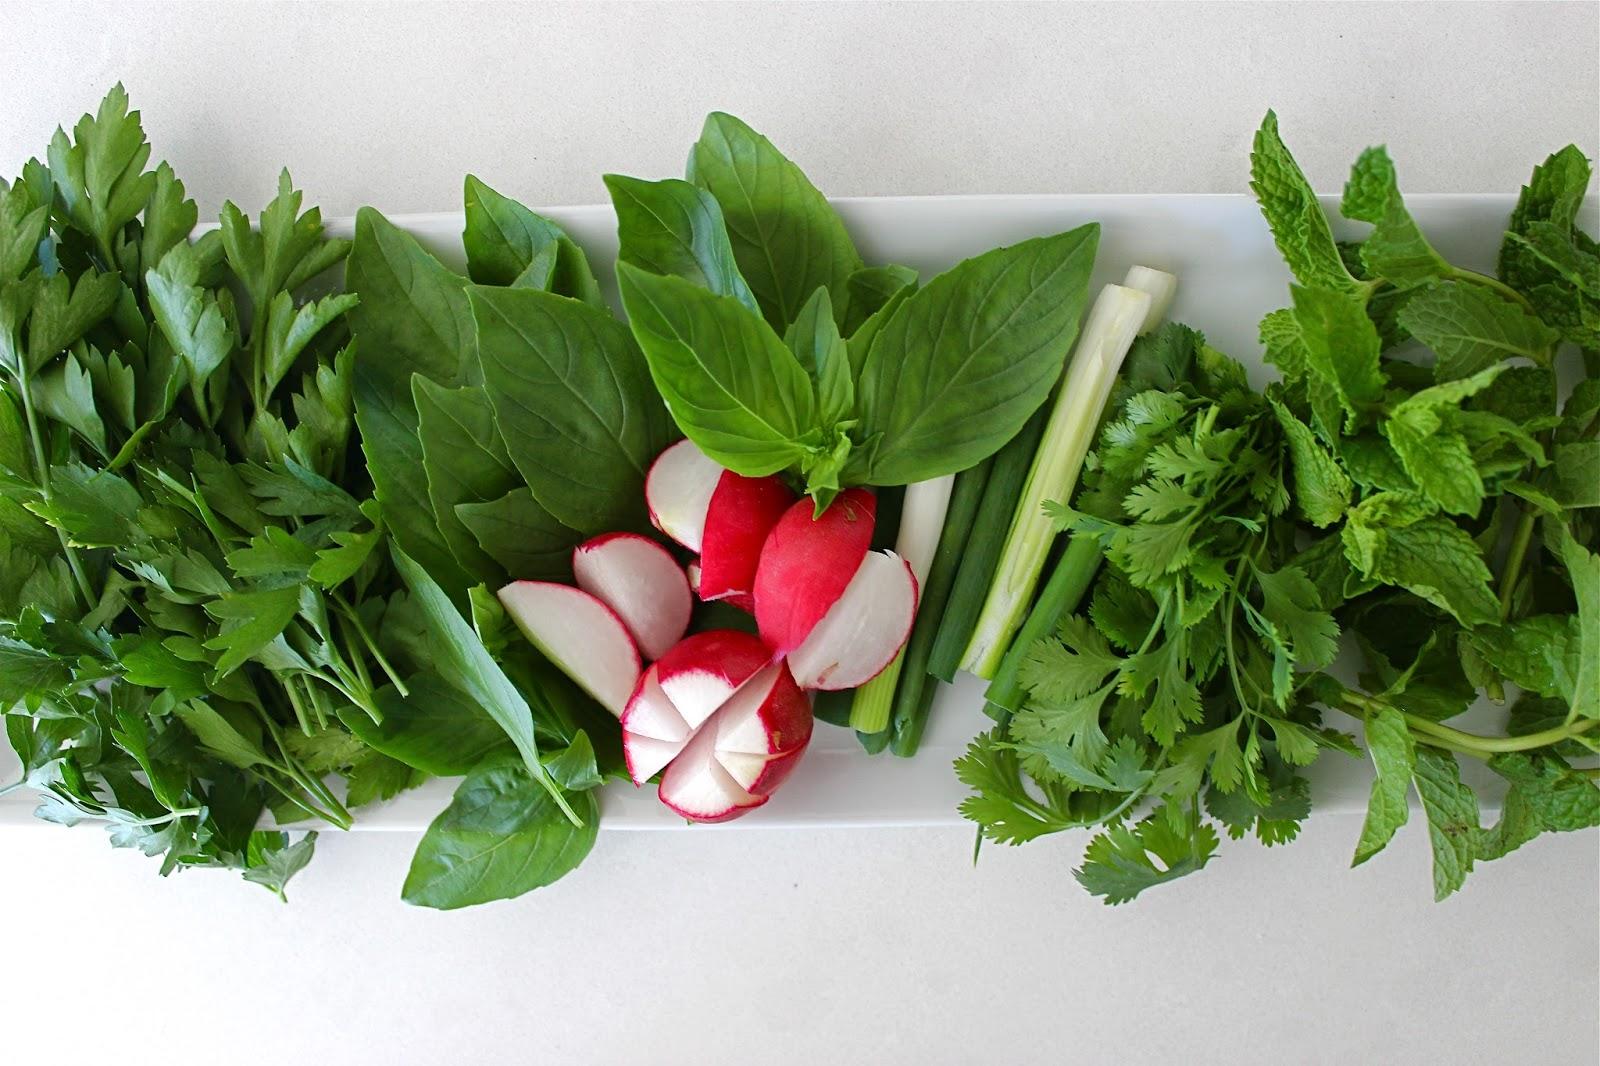 Bottom of the pot a platter of fresh herbs a balancing act sabzi